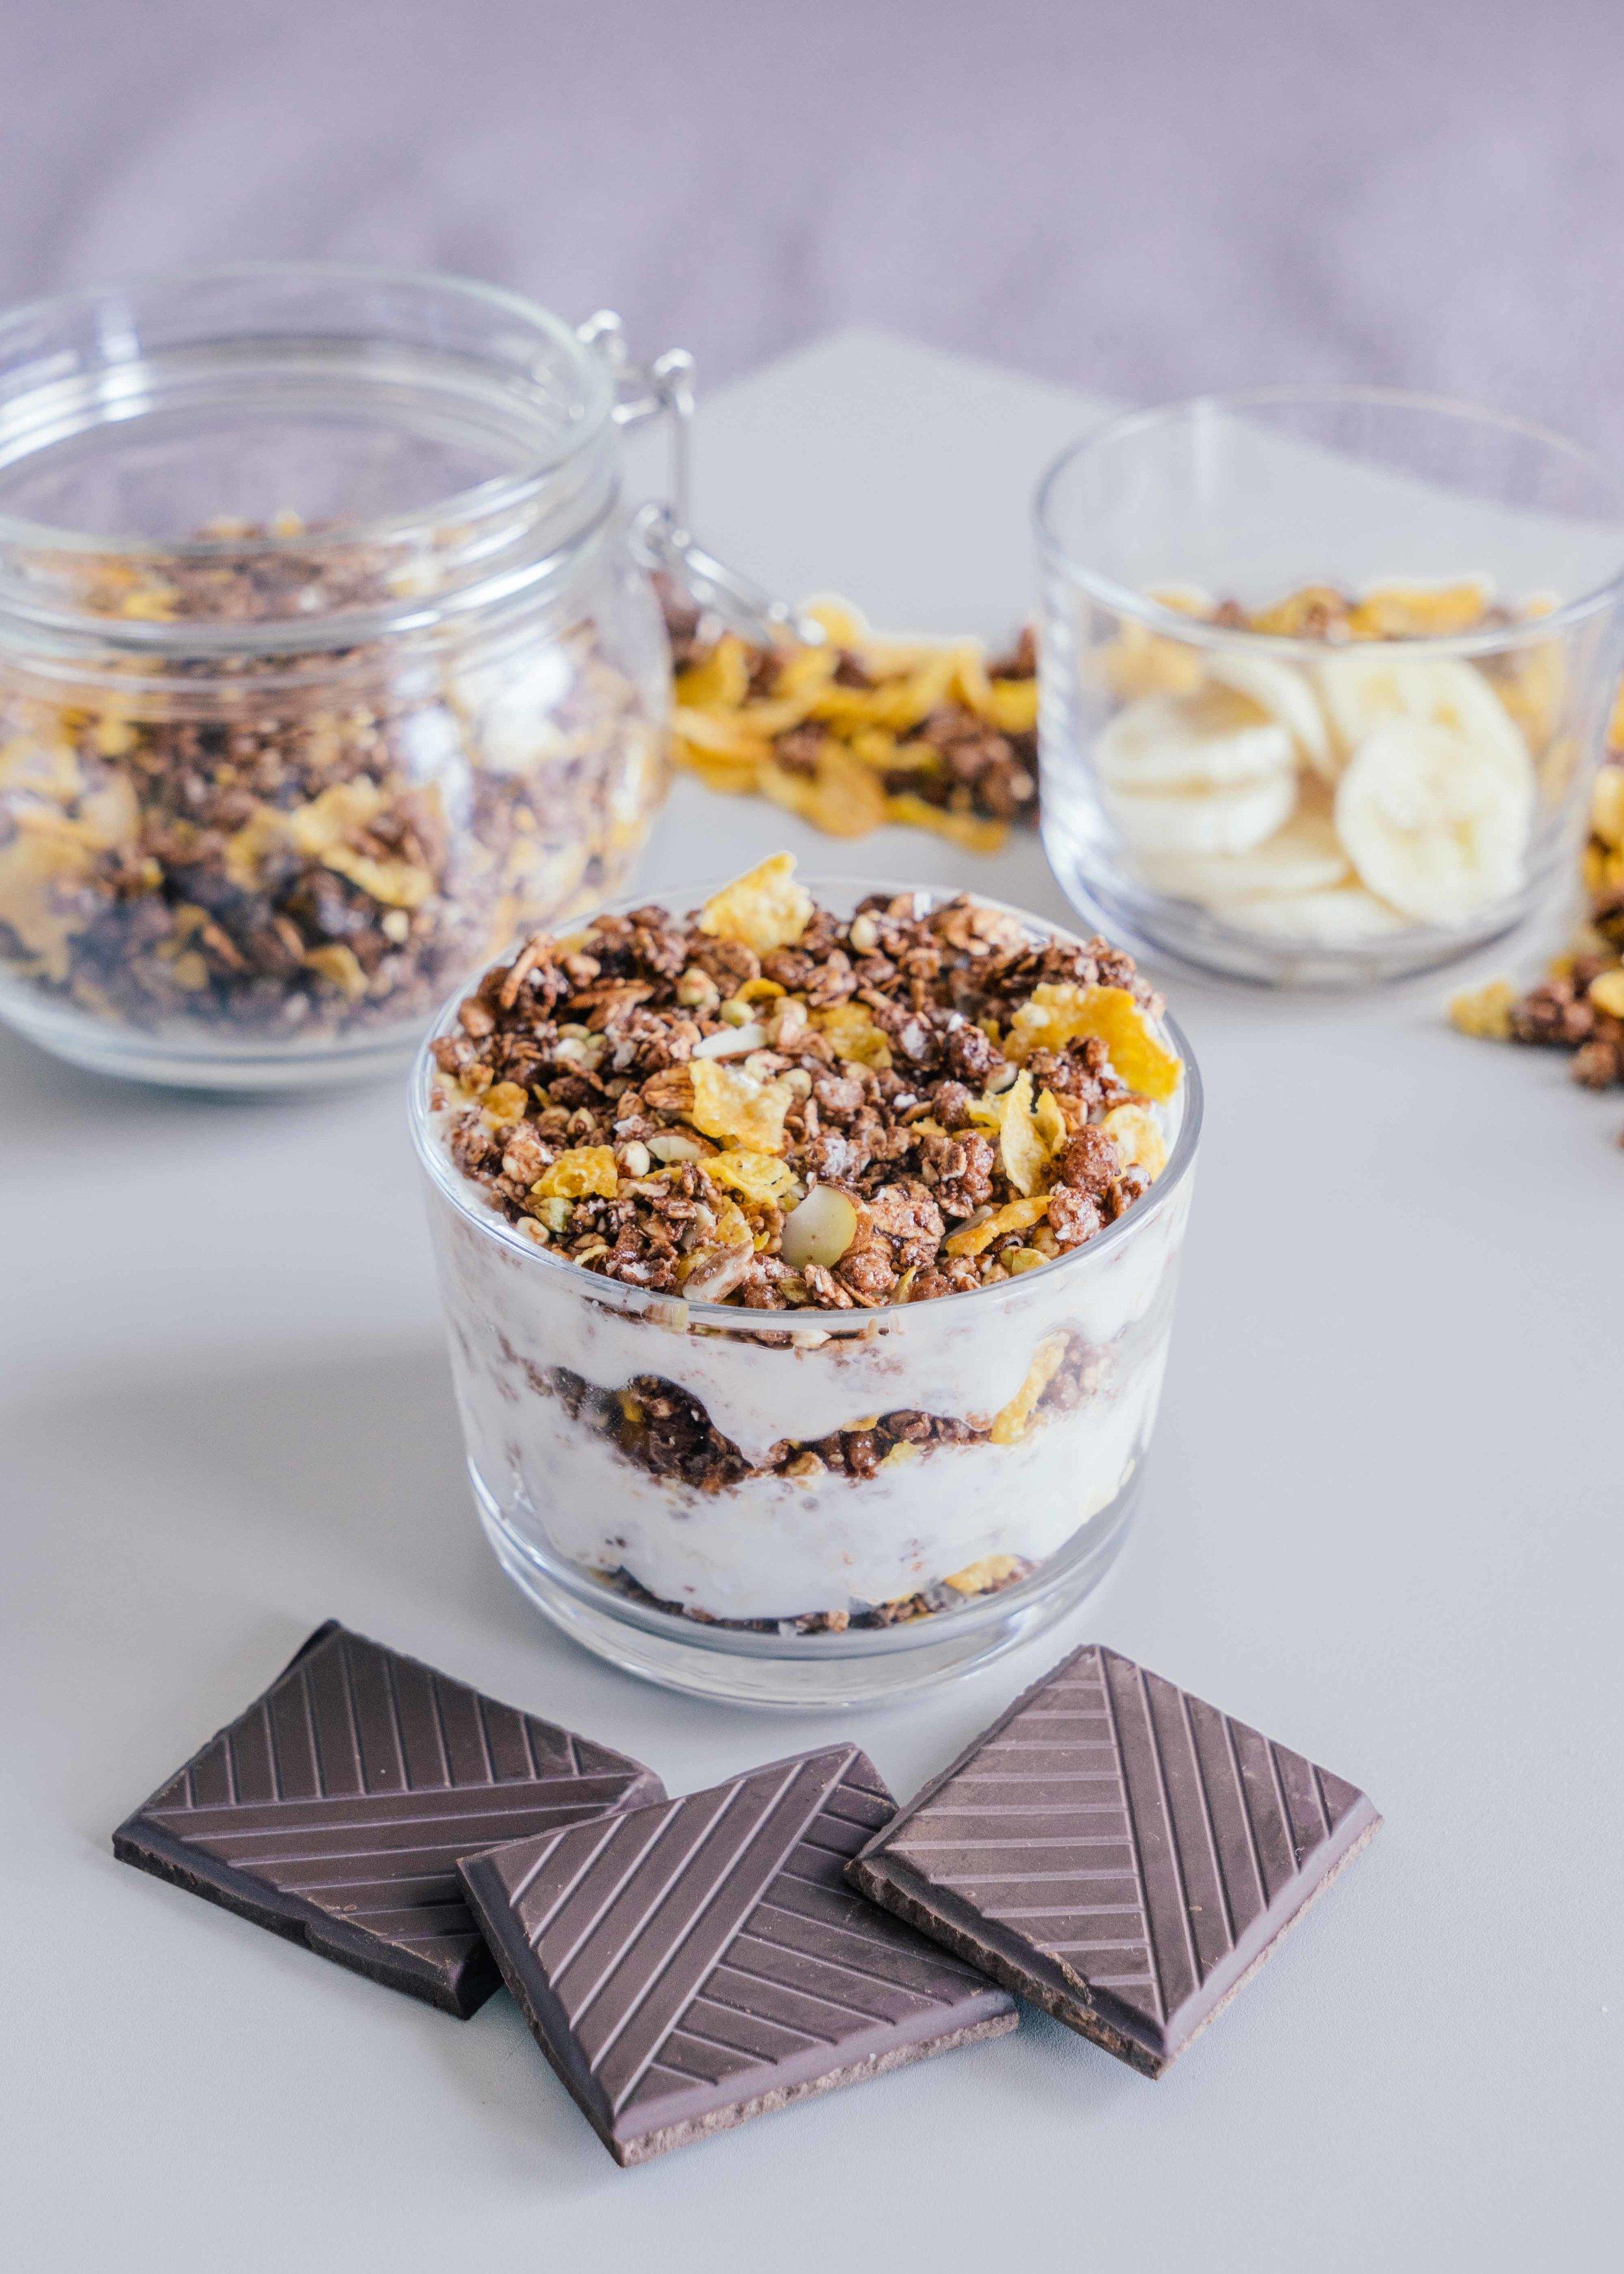 rice-and-shine-blog-quaker-granola-2018-06-04-19.jpg